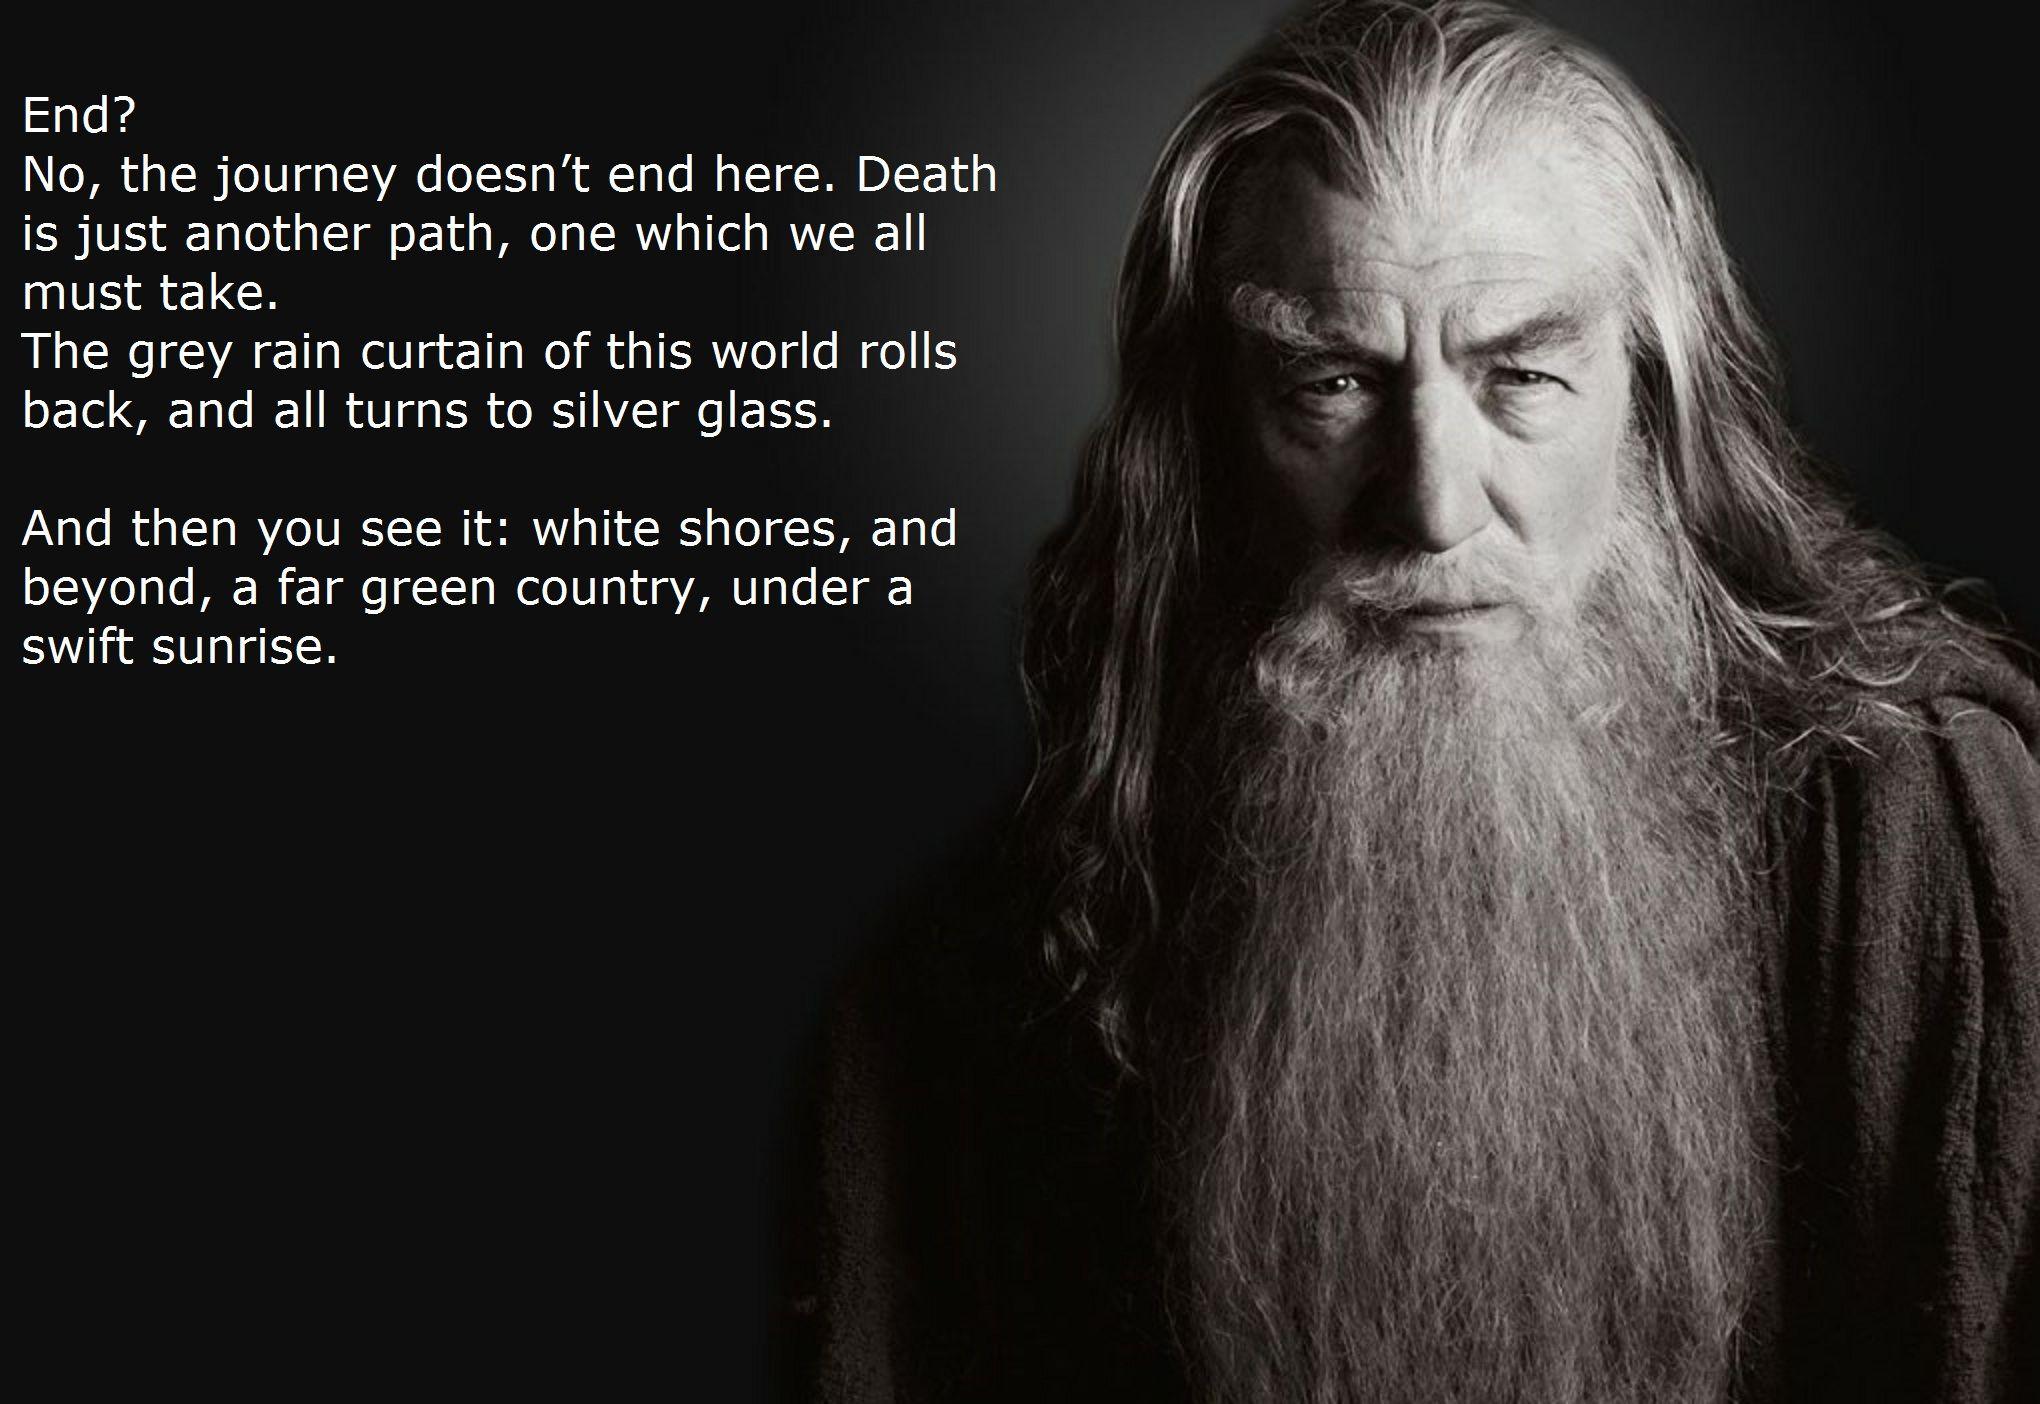 A description of the journey to death